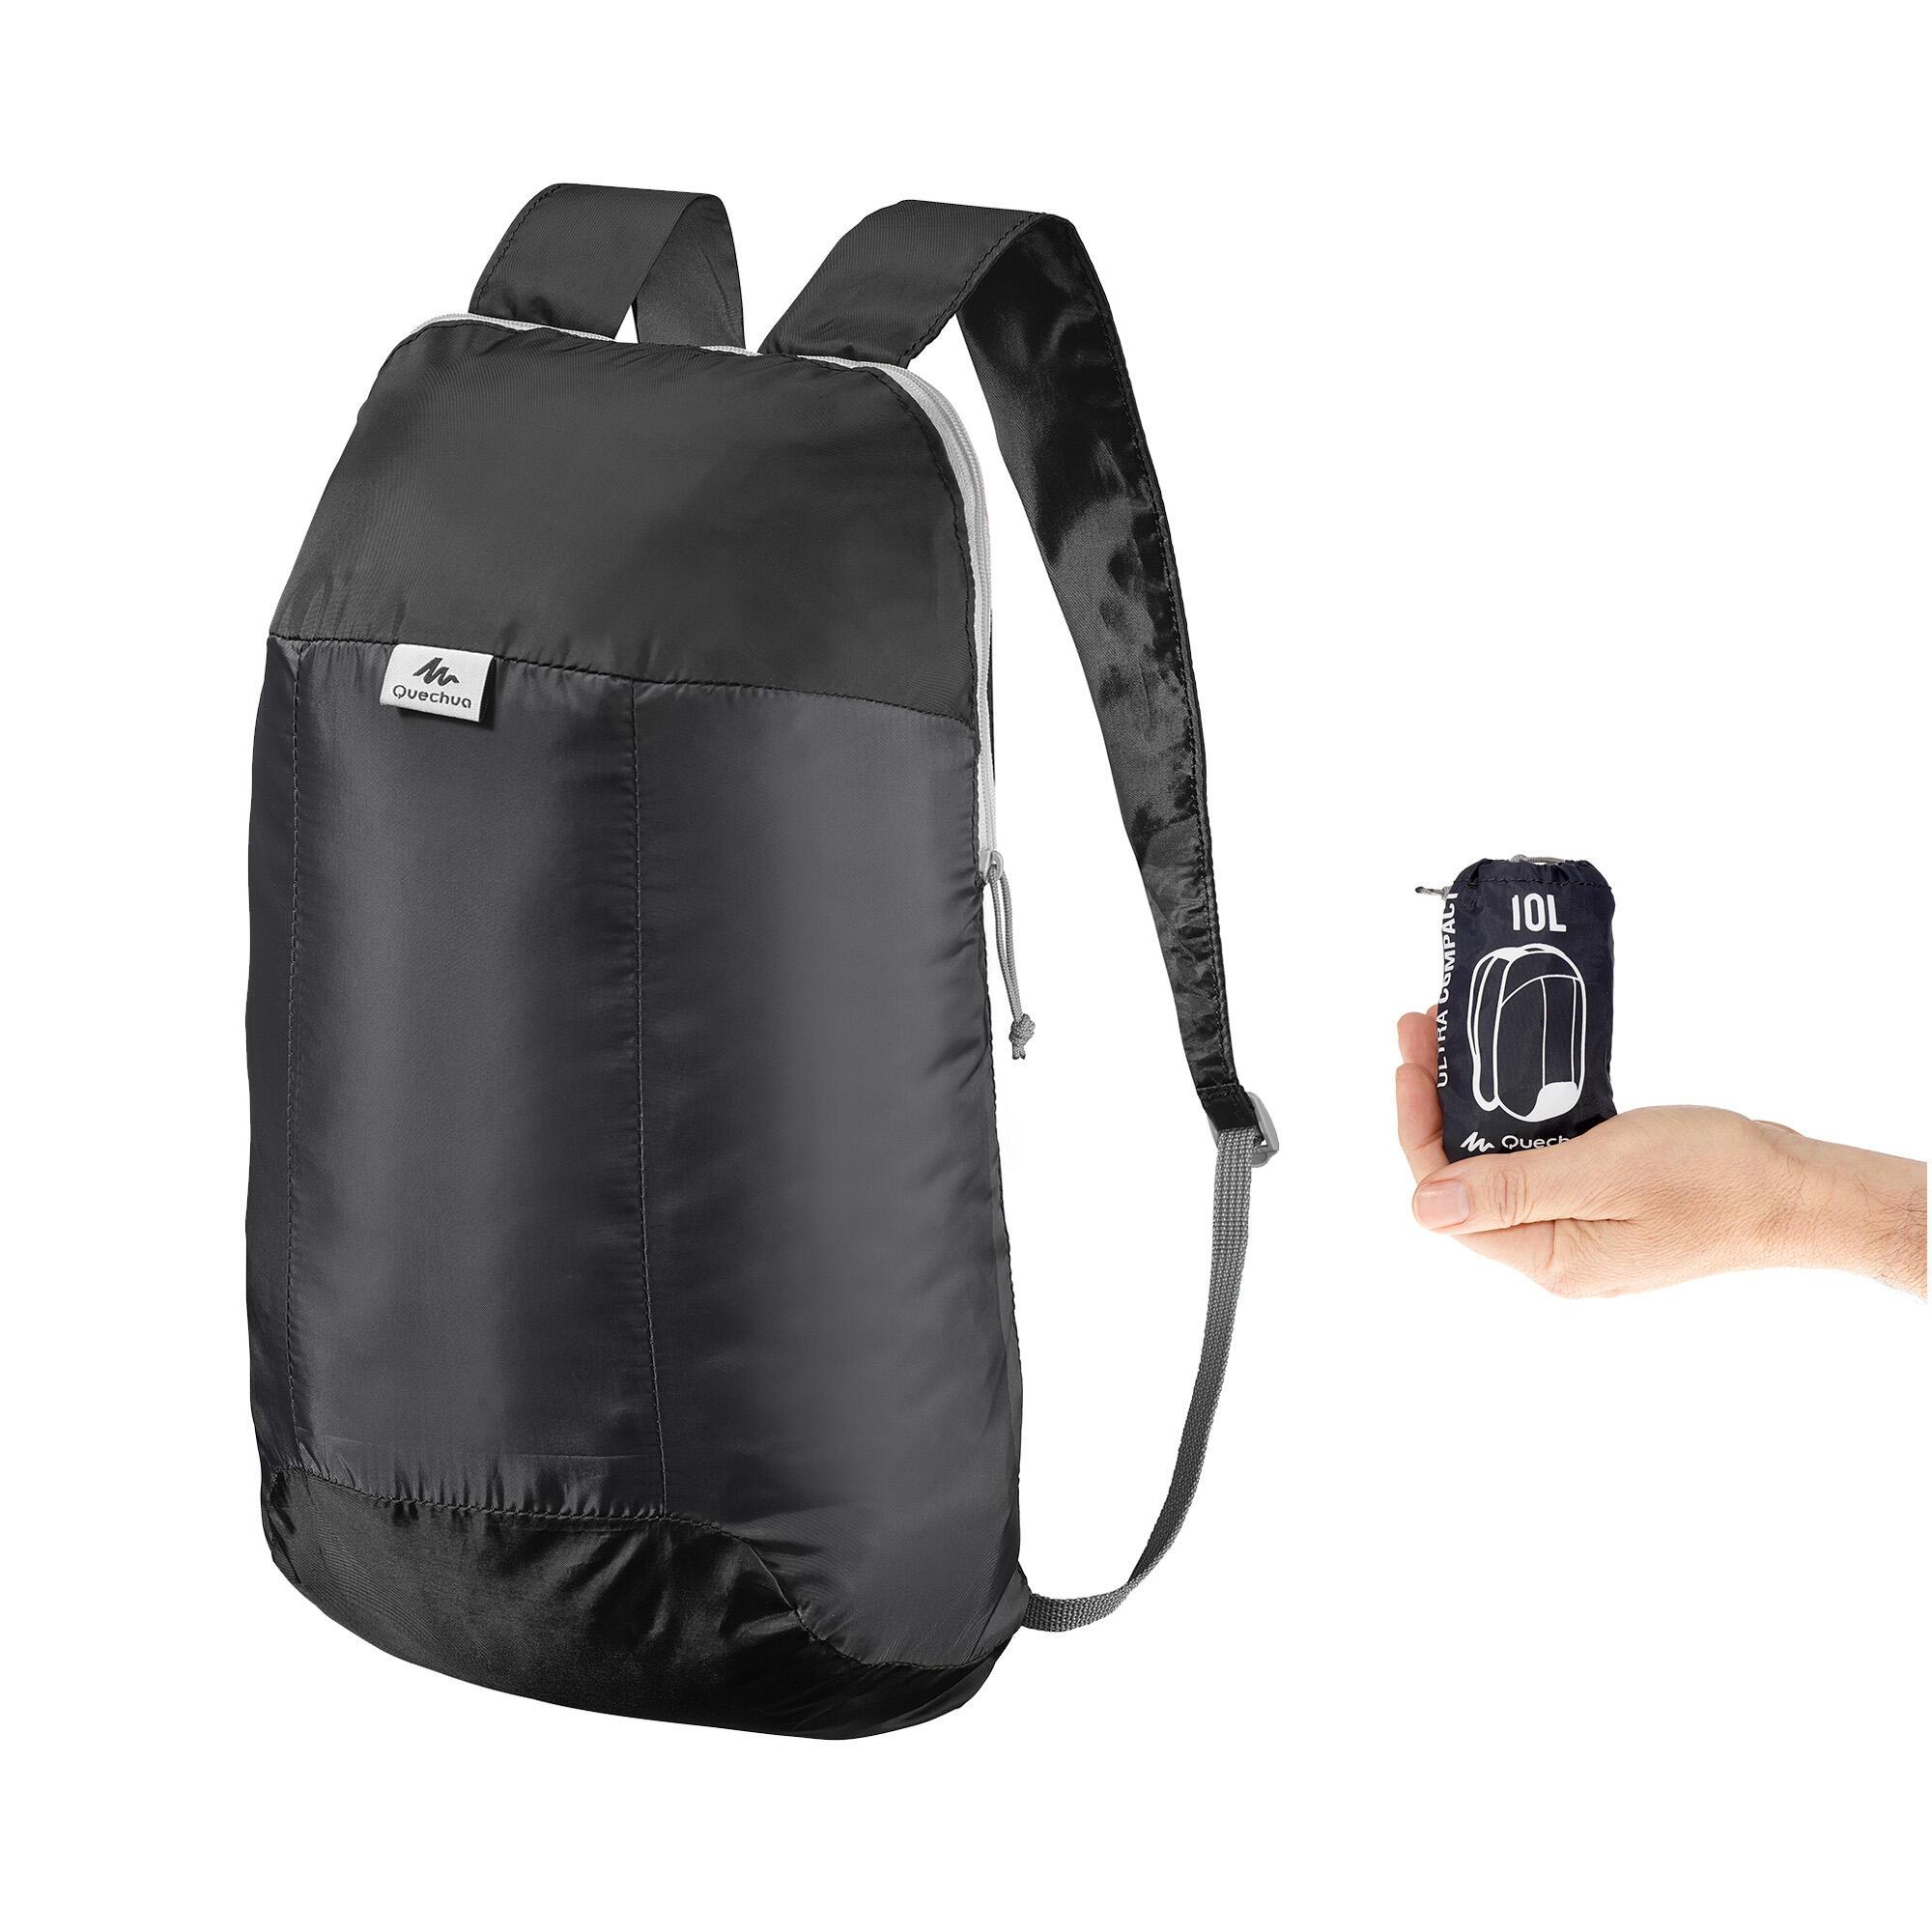 sac dos d 39 appoint ultra compact 10 litres noir quechua. Black Bedroom Furniture Sets. Home Design Ideas